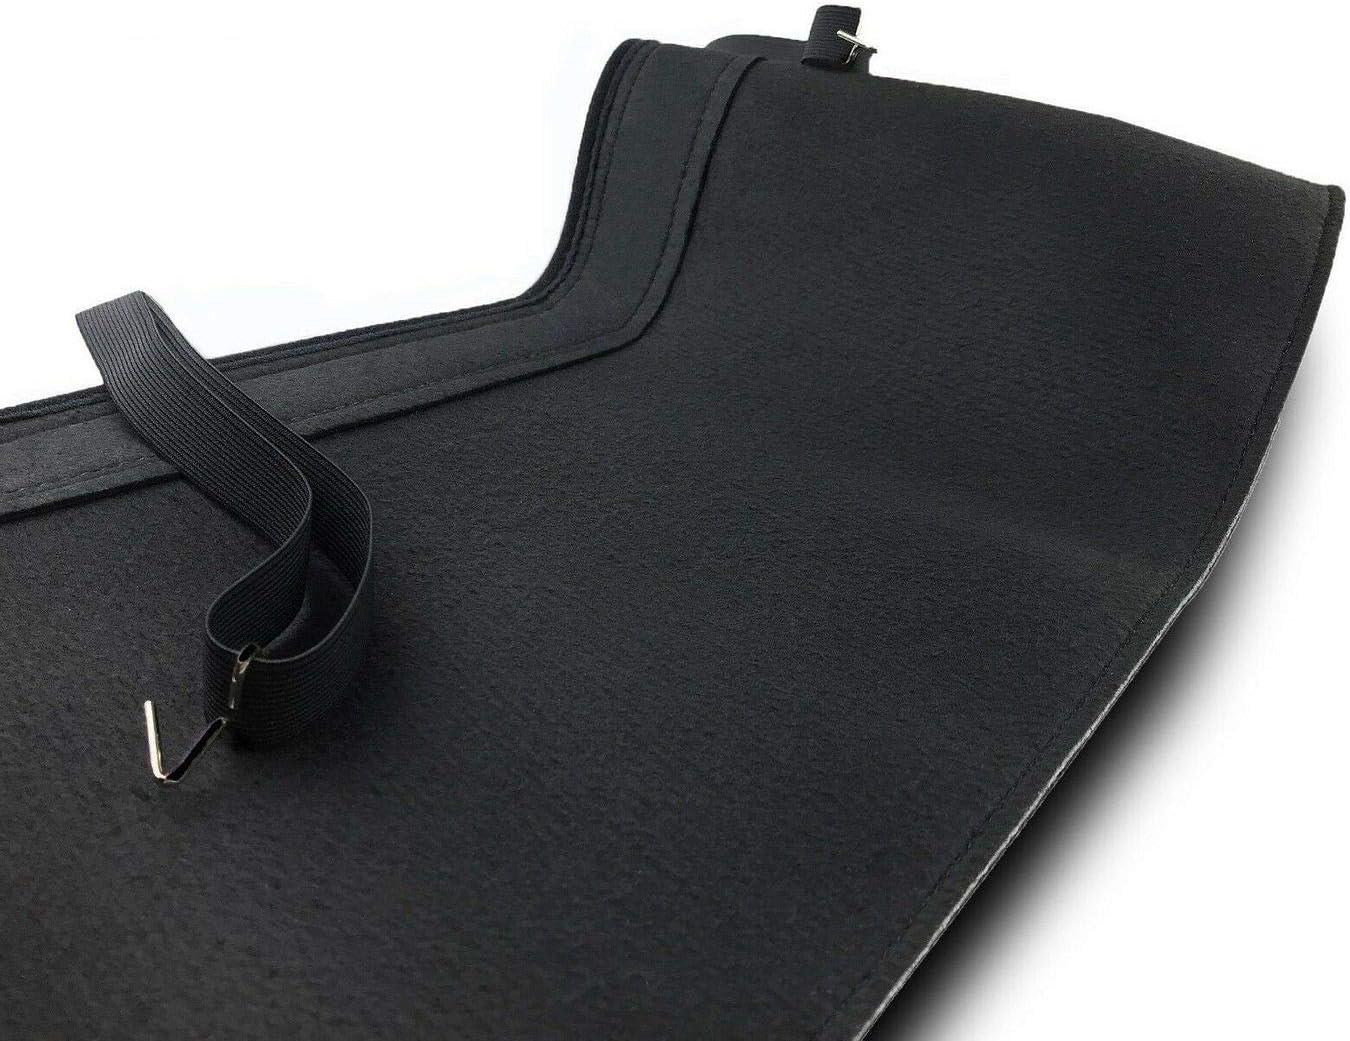 Stoneguard Black Stone impact protection Tief Tech Bonnet Hood Bra for 5-Serie E60 // E61 Engine Hoodcover